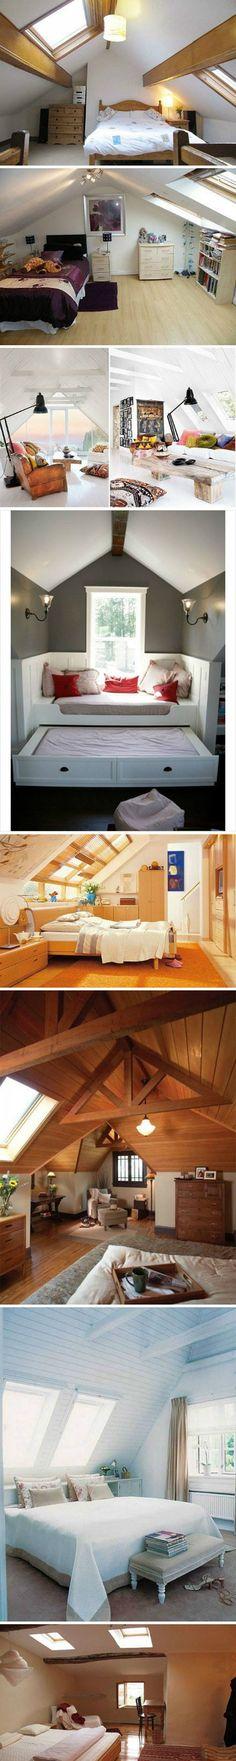 Home Decor ideas - http://ideasforho.me/home-decor-ideas-53/ -  #home decor #design #home decor ideas #living room #bedroom #kitchen #bathroom #interior ideas